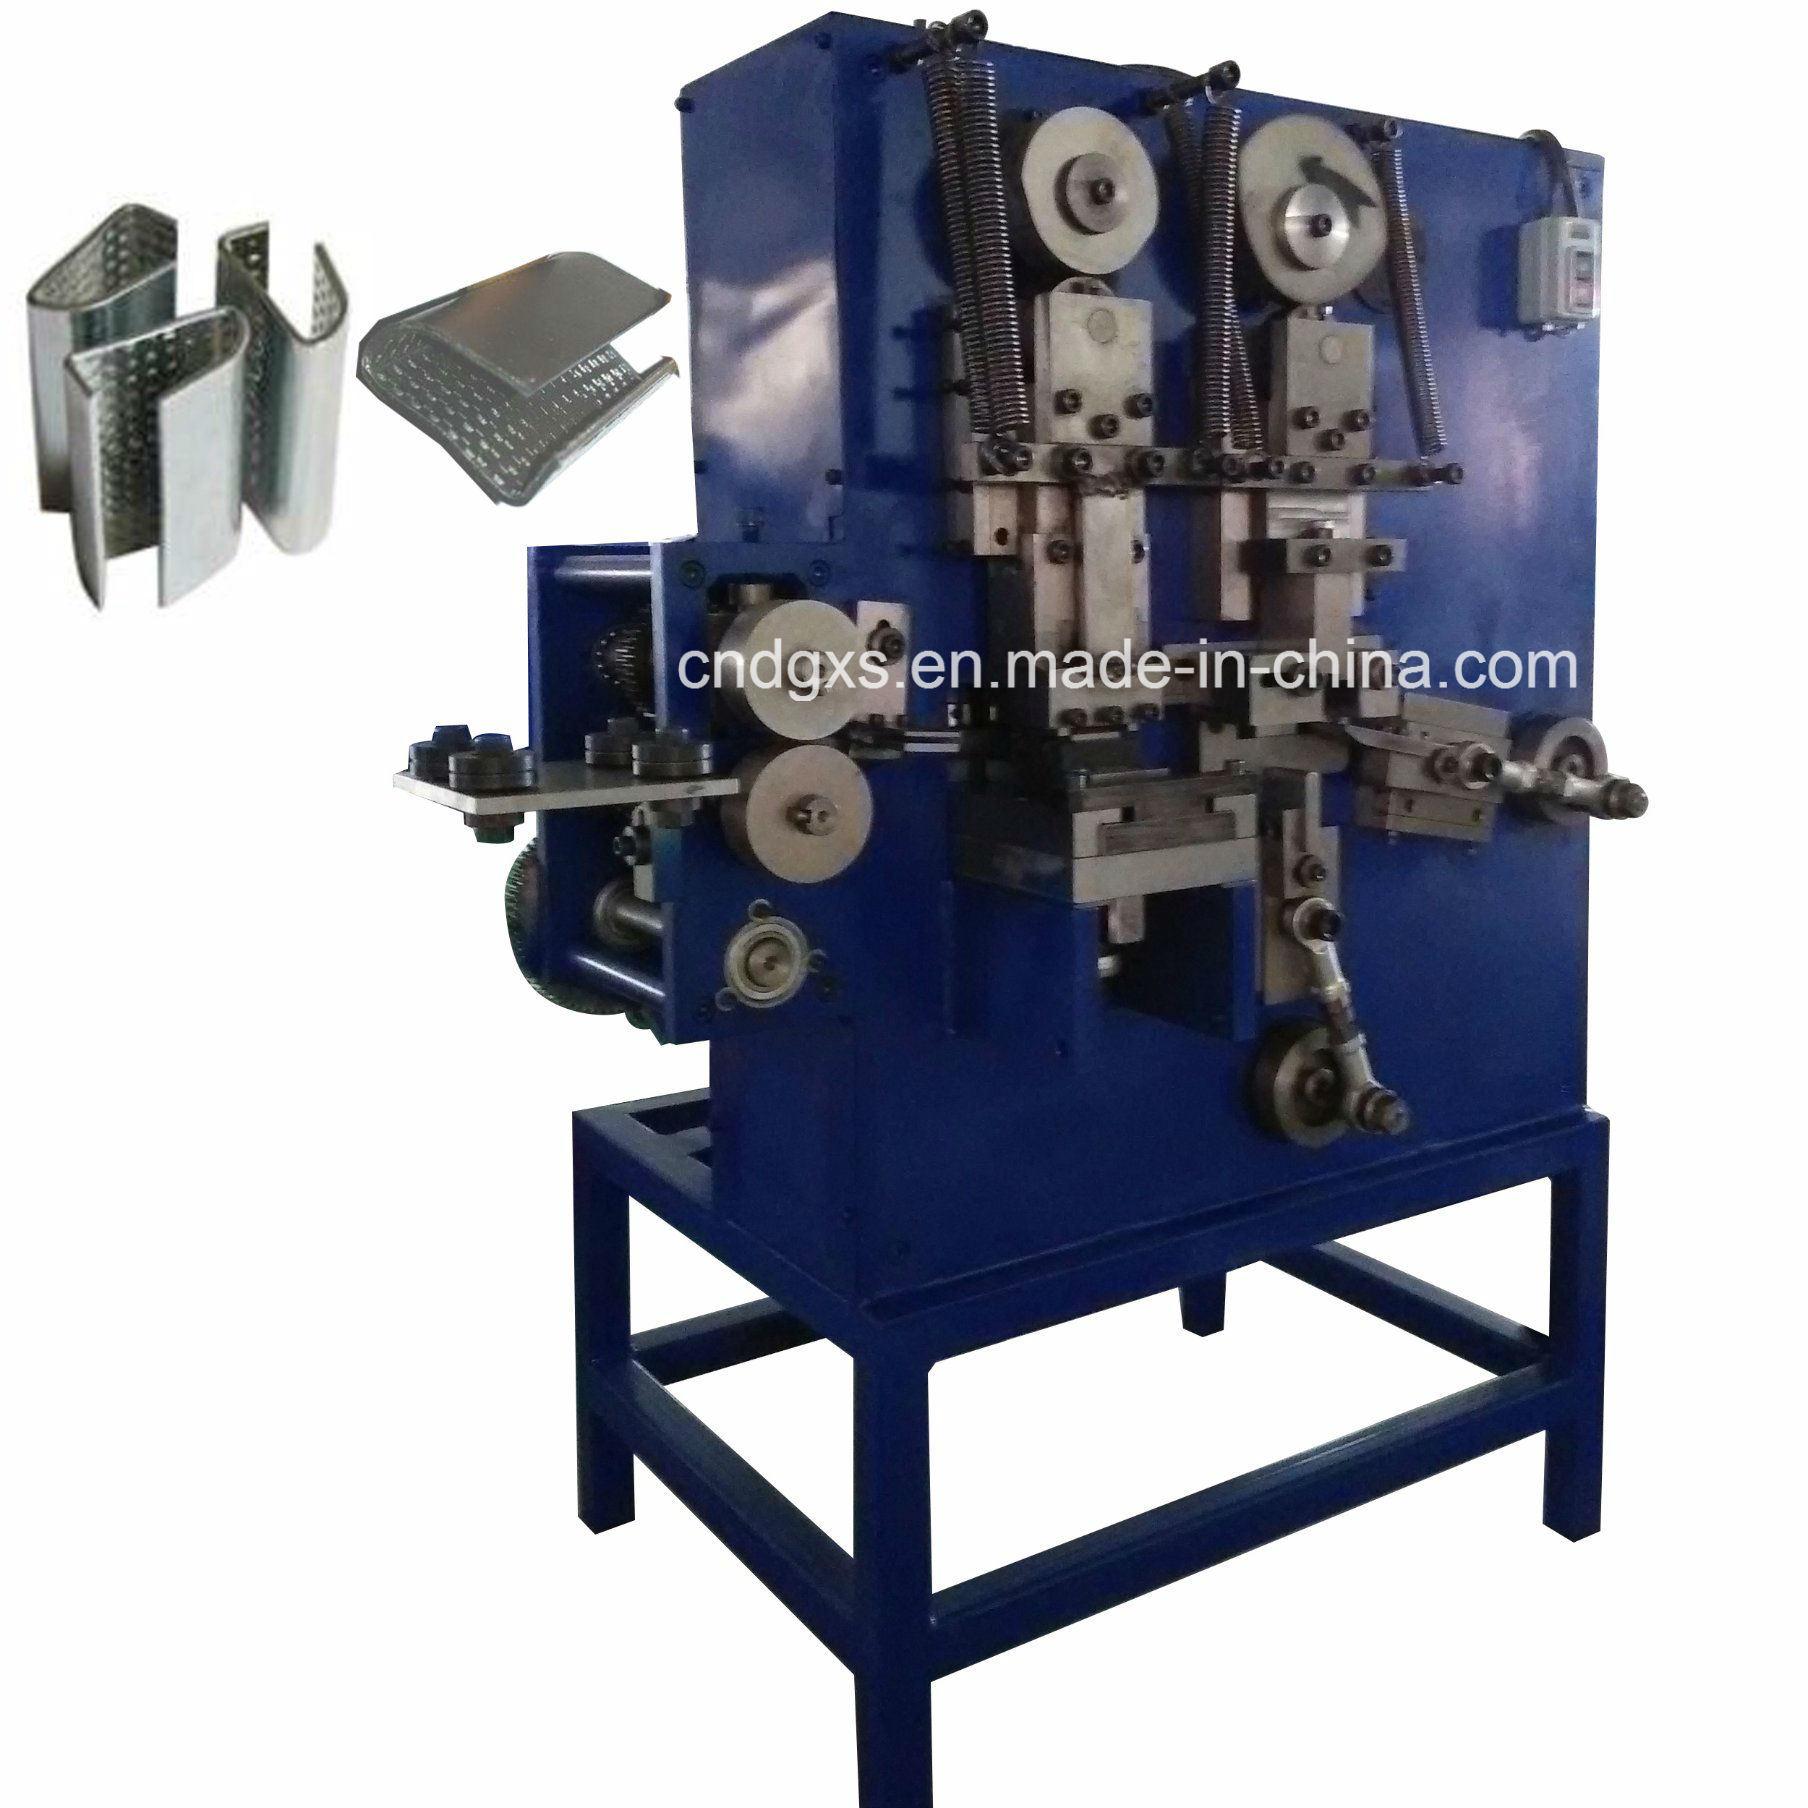 Automatic Mechanical Metal Serrated Pet Seal Bending Machine